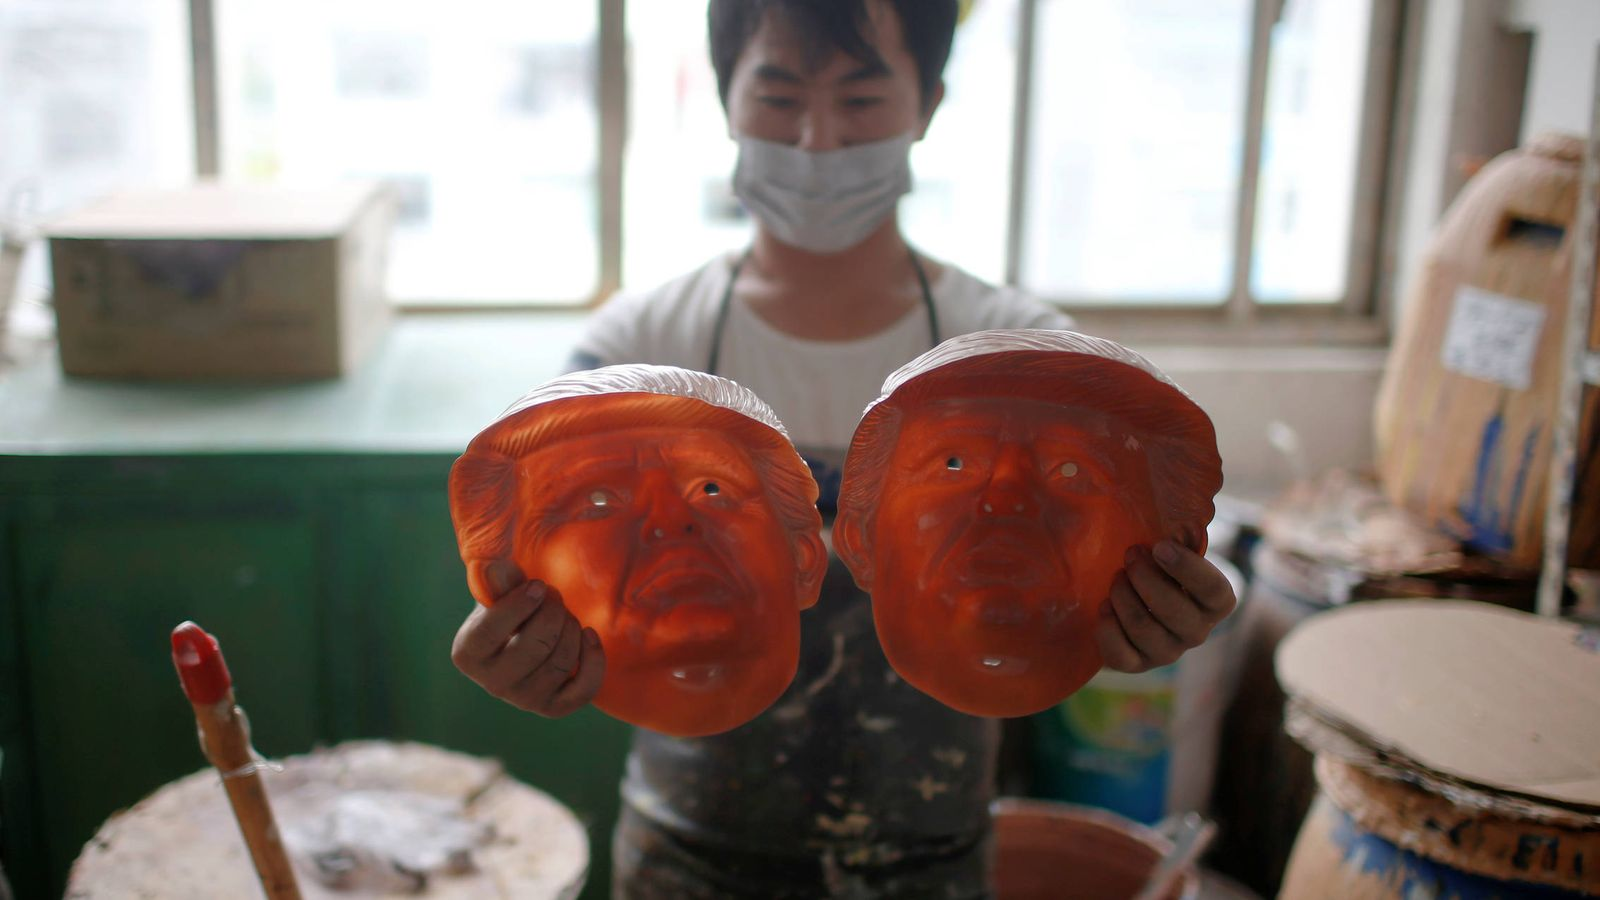 Foto: Un trabajador observa dos caretas de Donald Trump en una fábrica de Jinhua, en la provincia de Zhejiang (Reuters).